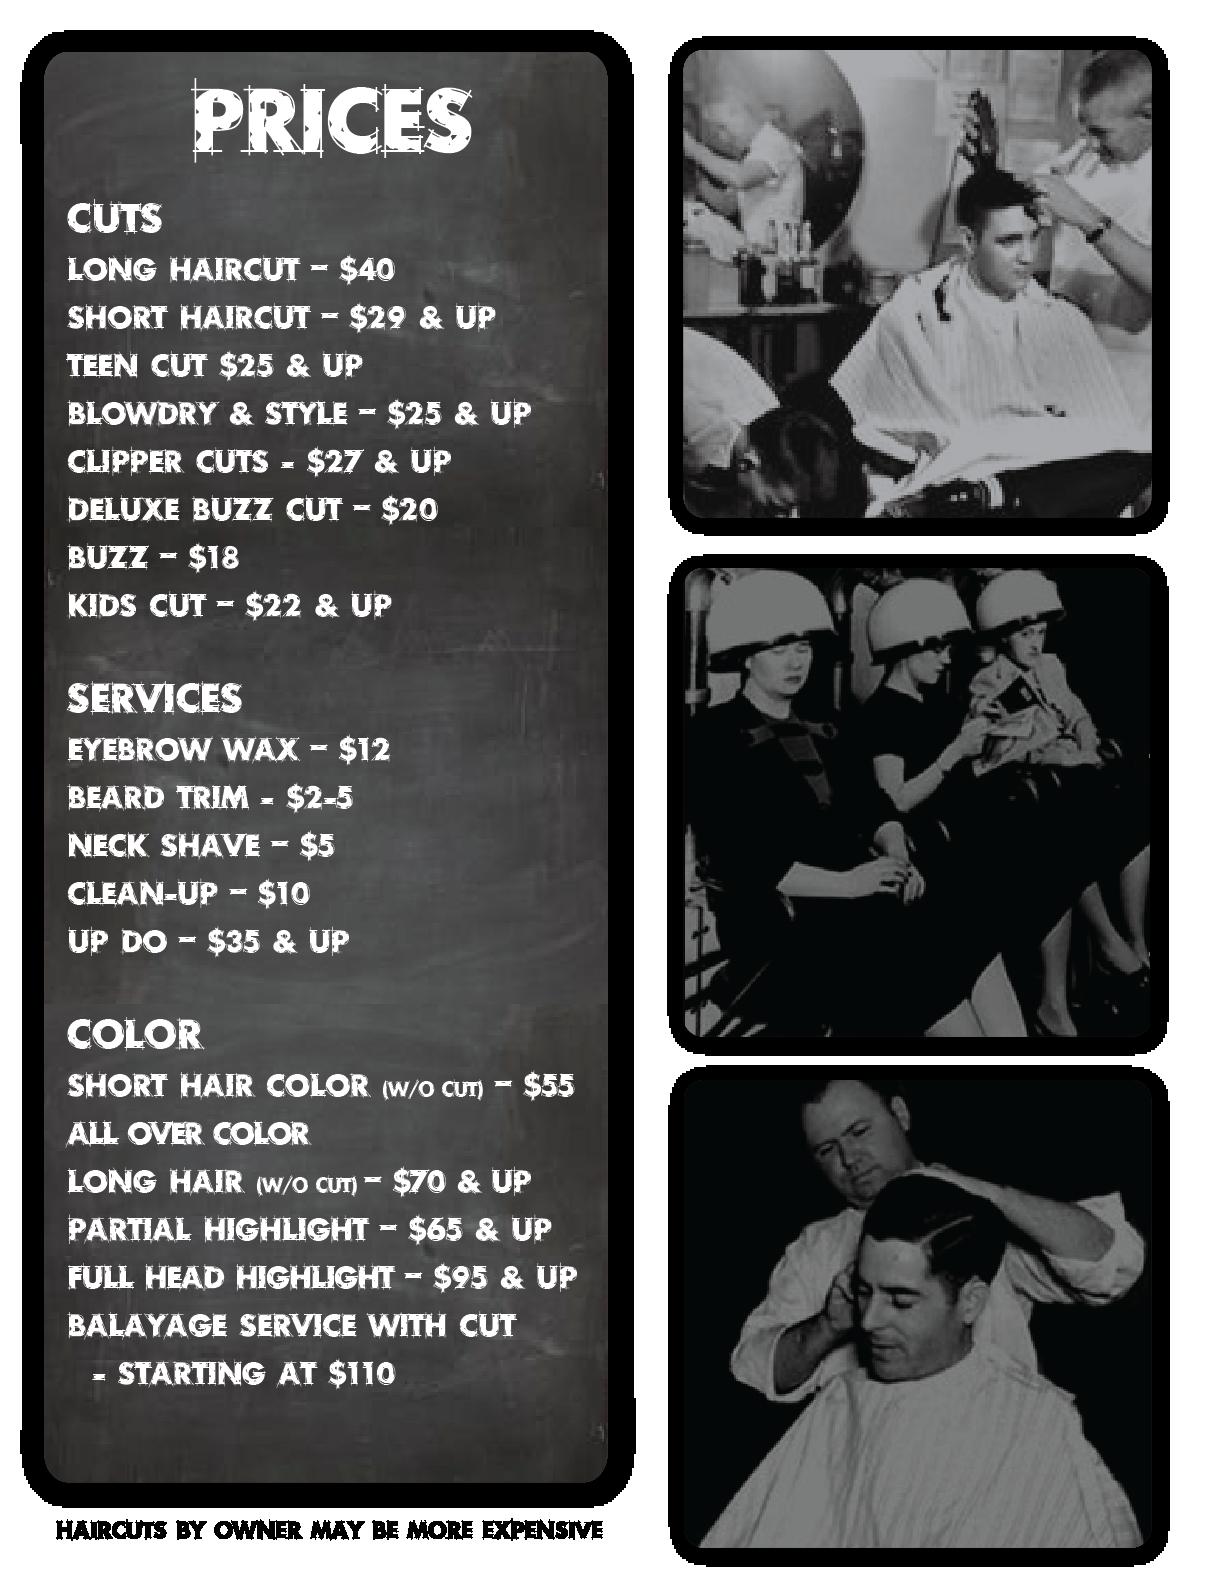 Prices10.21.19